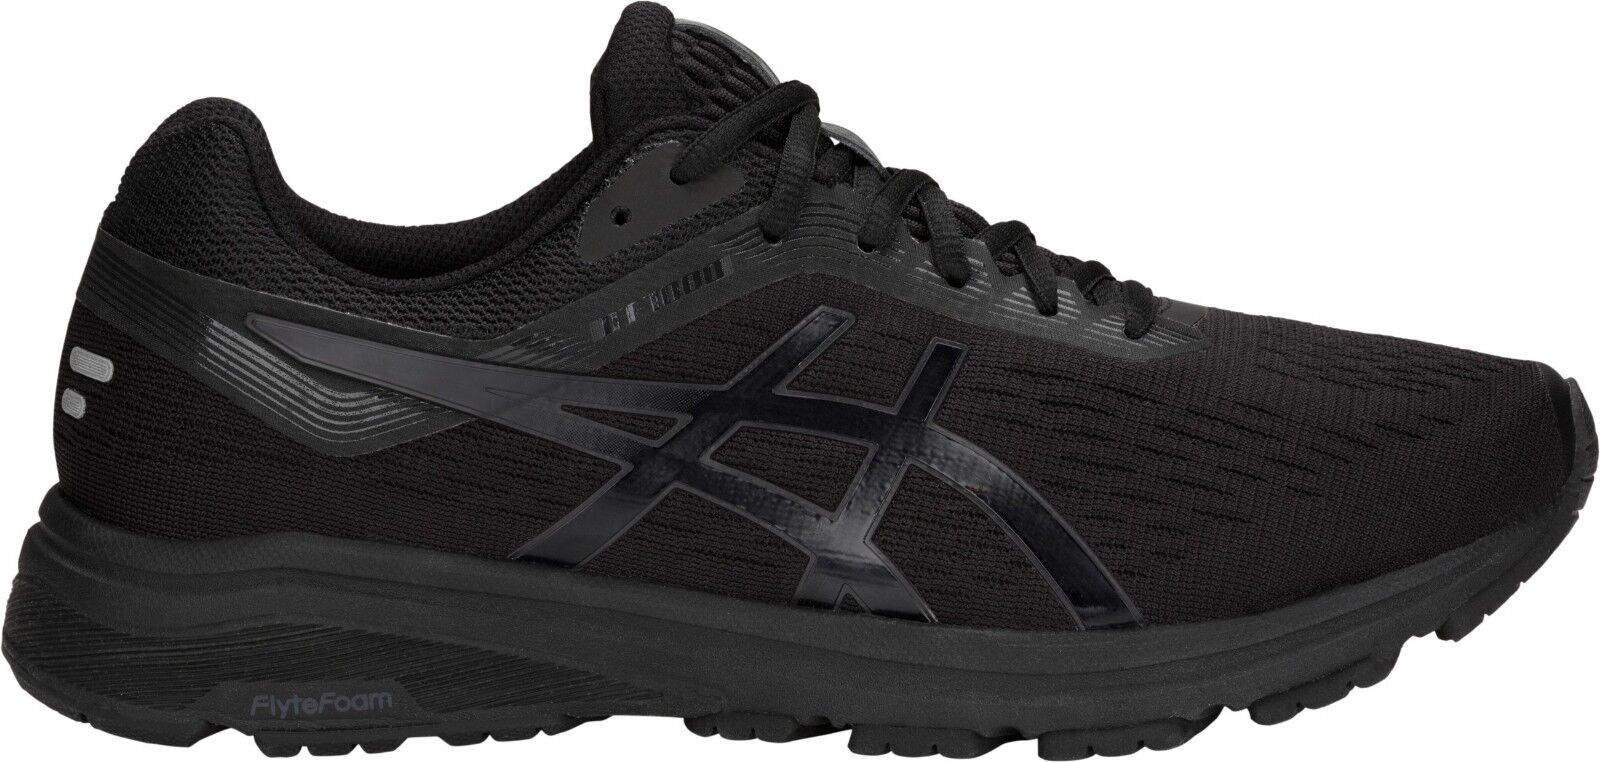 BARGAINAsics GT 1000  7 Mens Running scarpe (4E) (001)  prodotti creativi